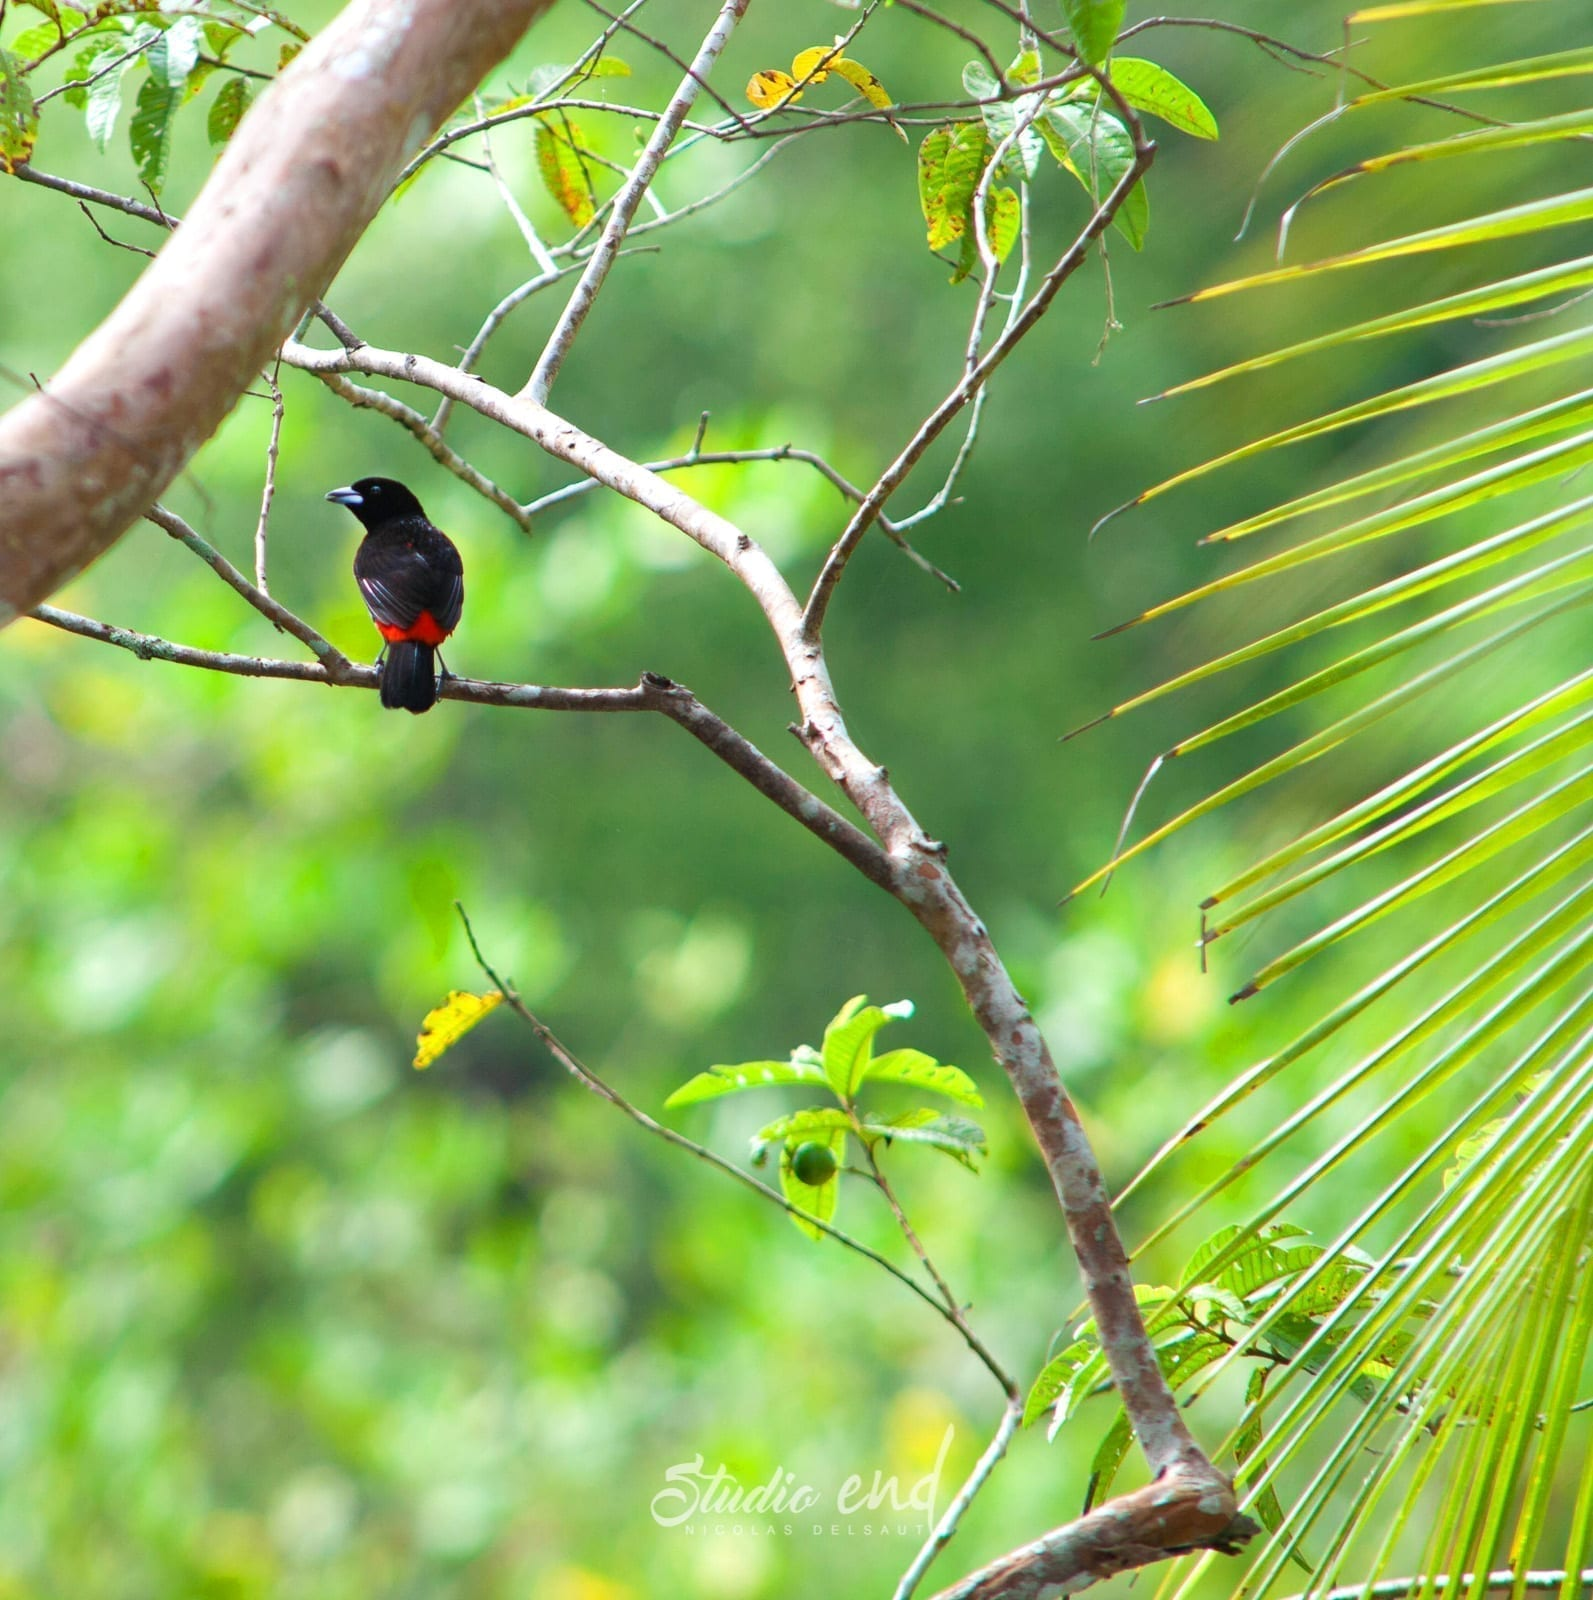 Photographie et reportage de voyage, animalier, oiseau Costa Rica Nicolas Delsaut